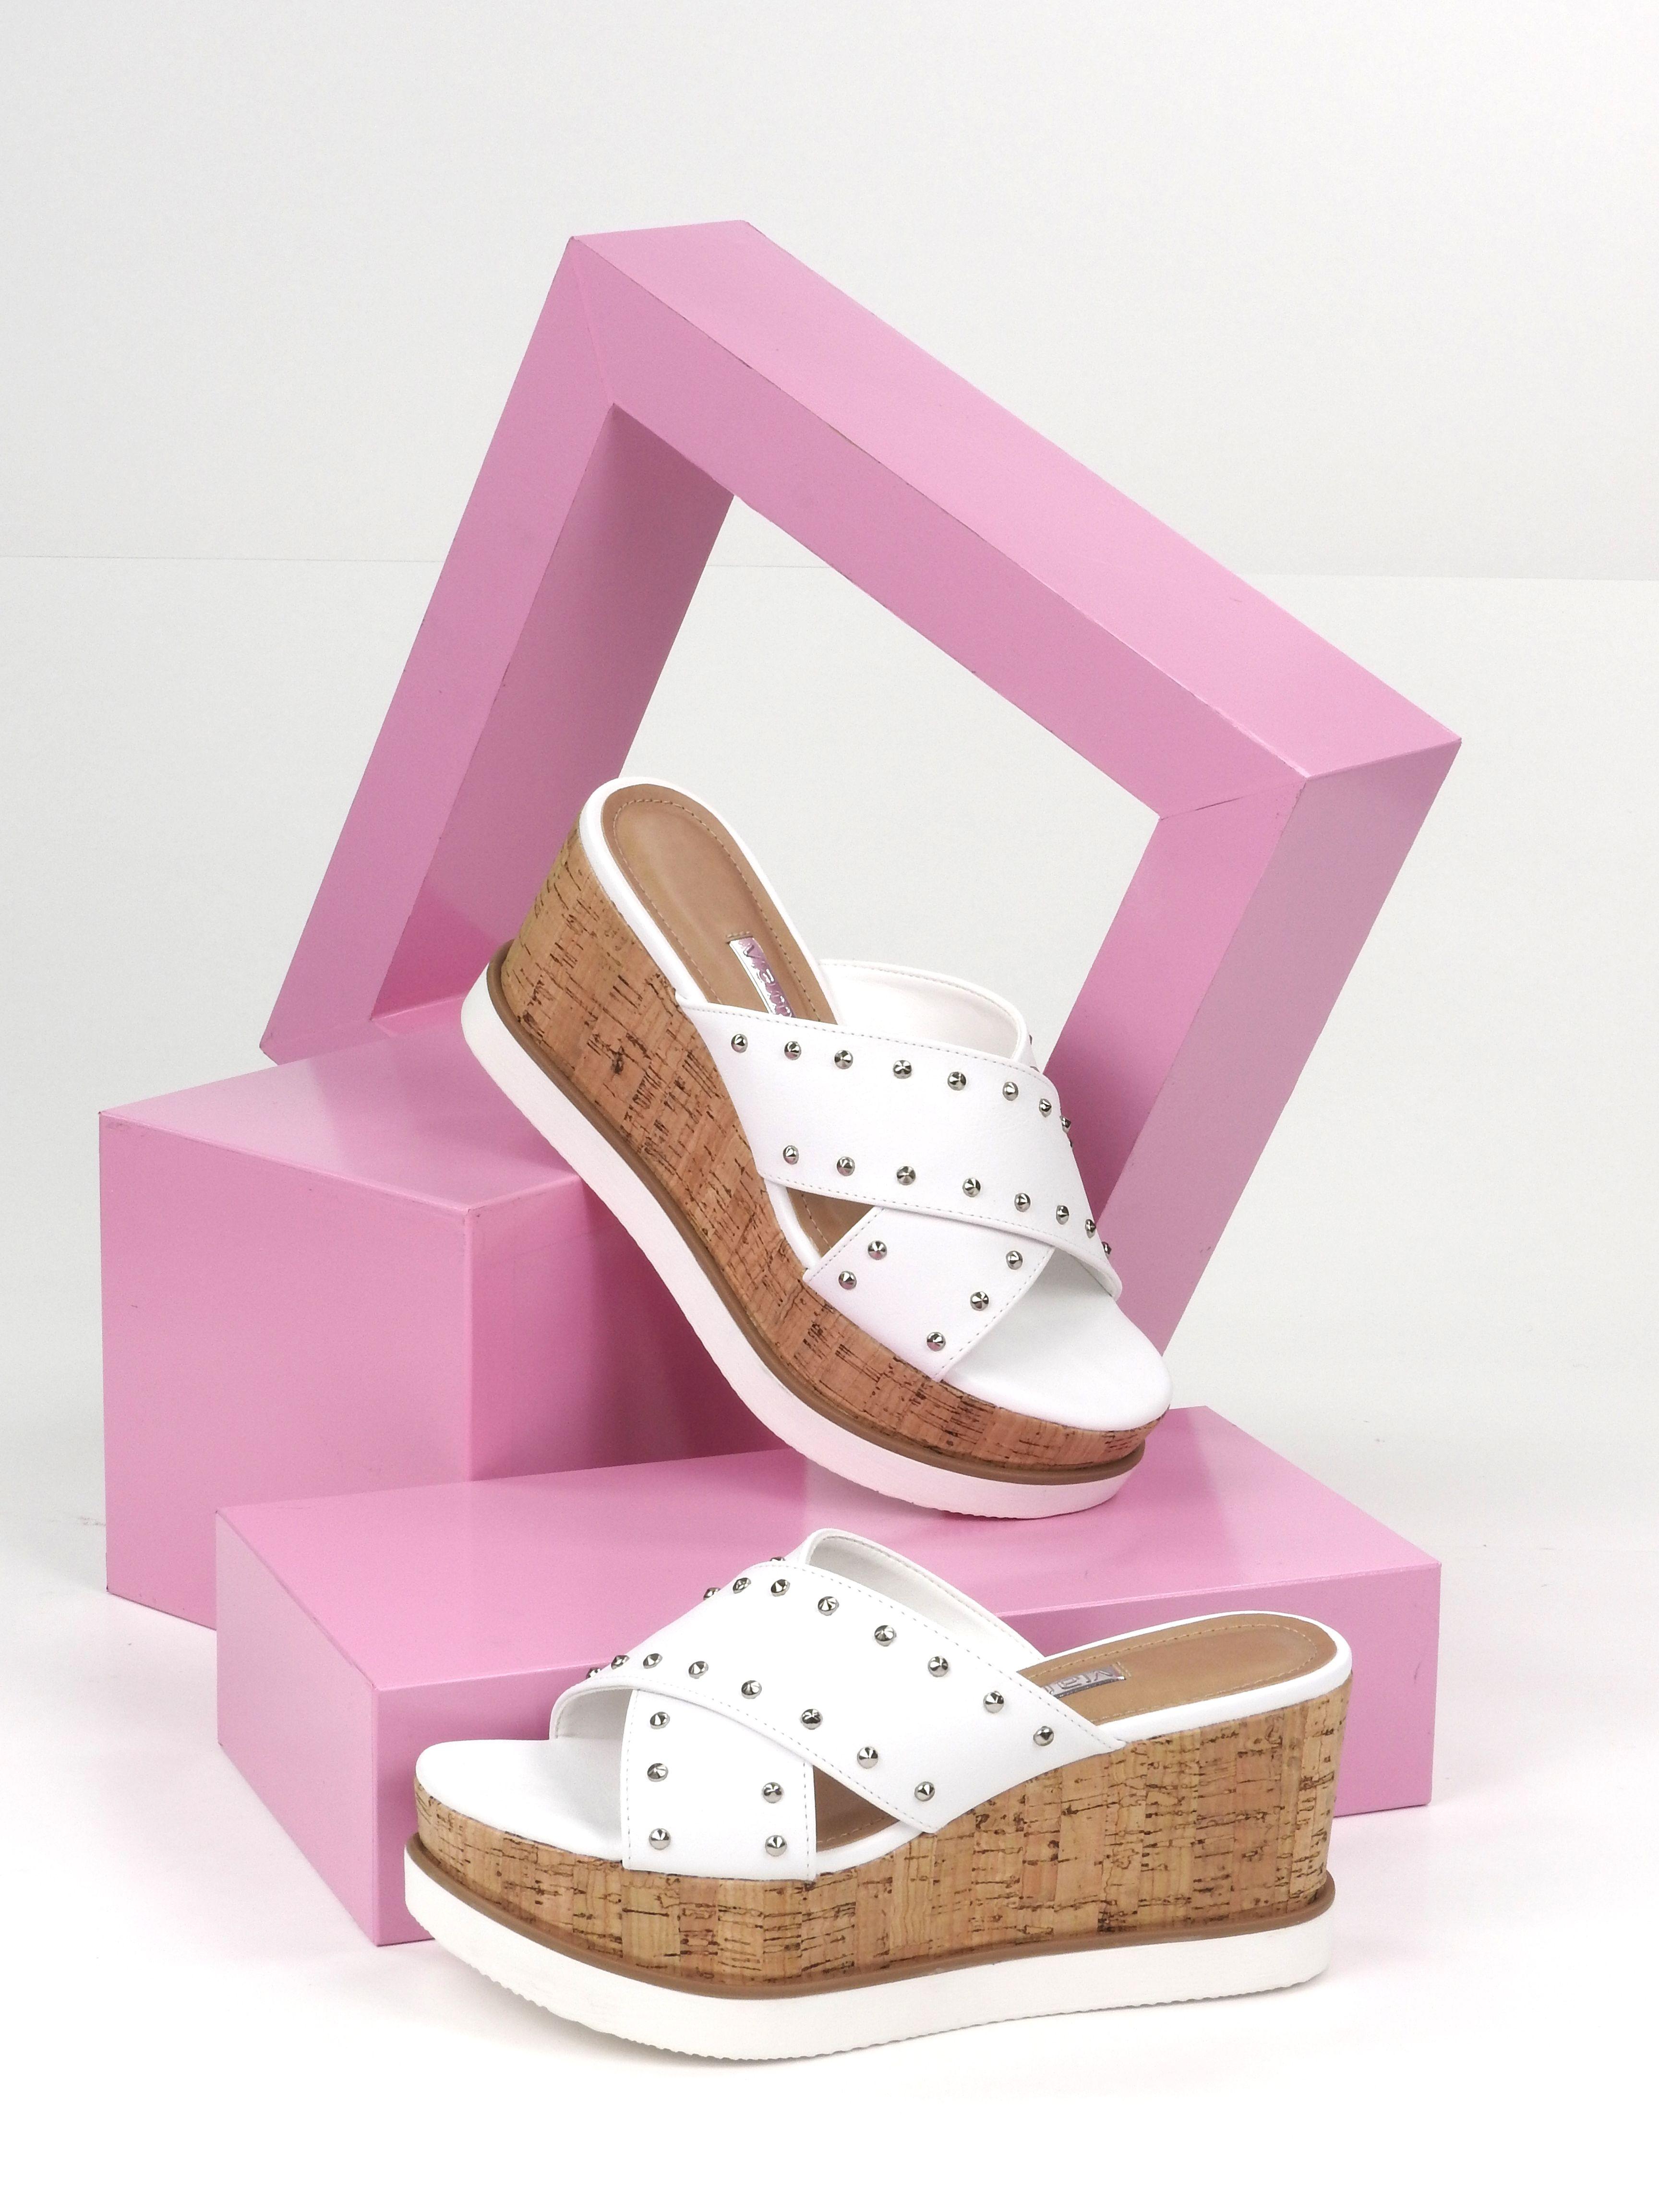 324eca59075 Tamancos - Estilo - Fashion - Moderno - Hit Sandalias Cómodas, Zapatos  Cómodos, Sandalias